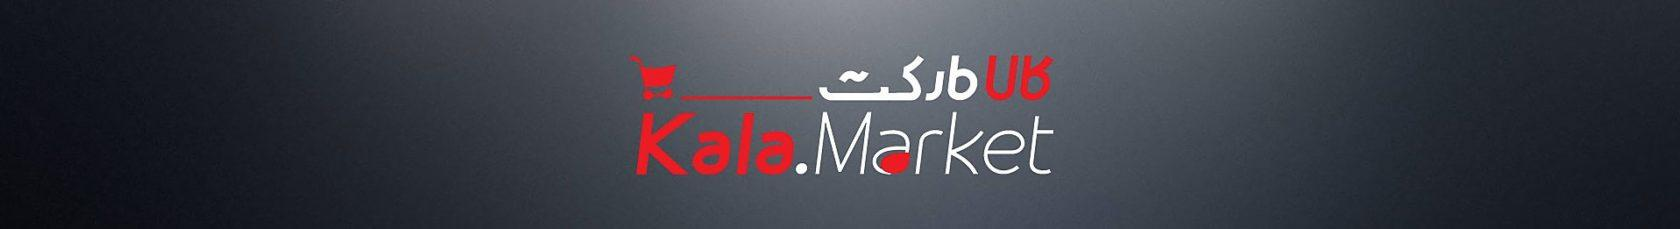 Kala-Market - Global Header - تماس با ما